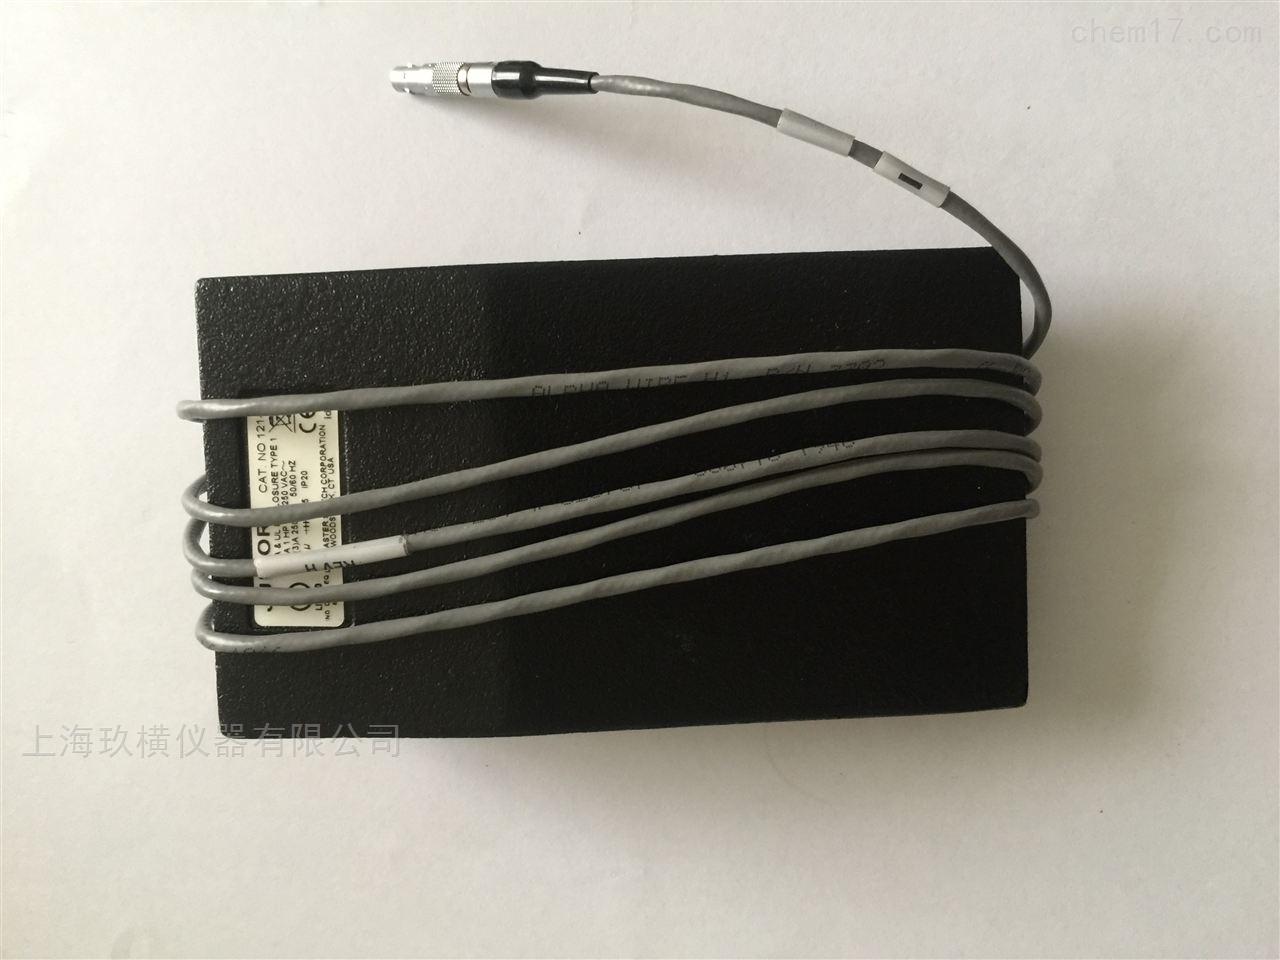 Magna-Mike 8600霍爾效應測厚儀的探頭種類